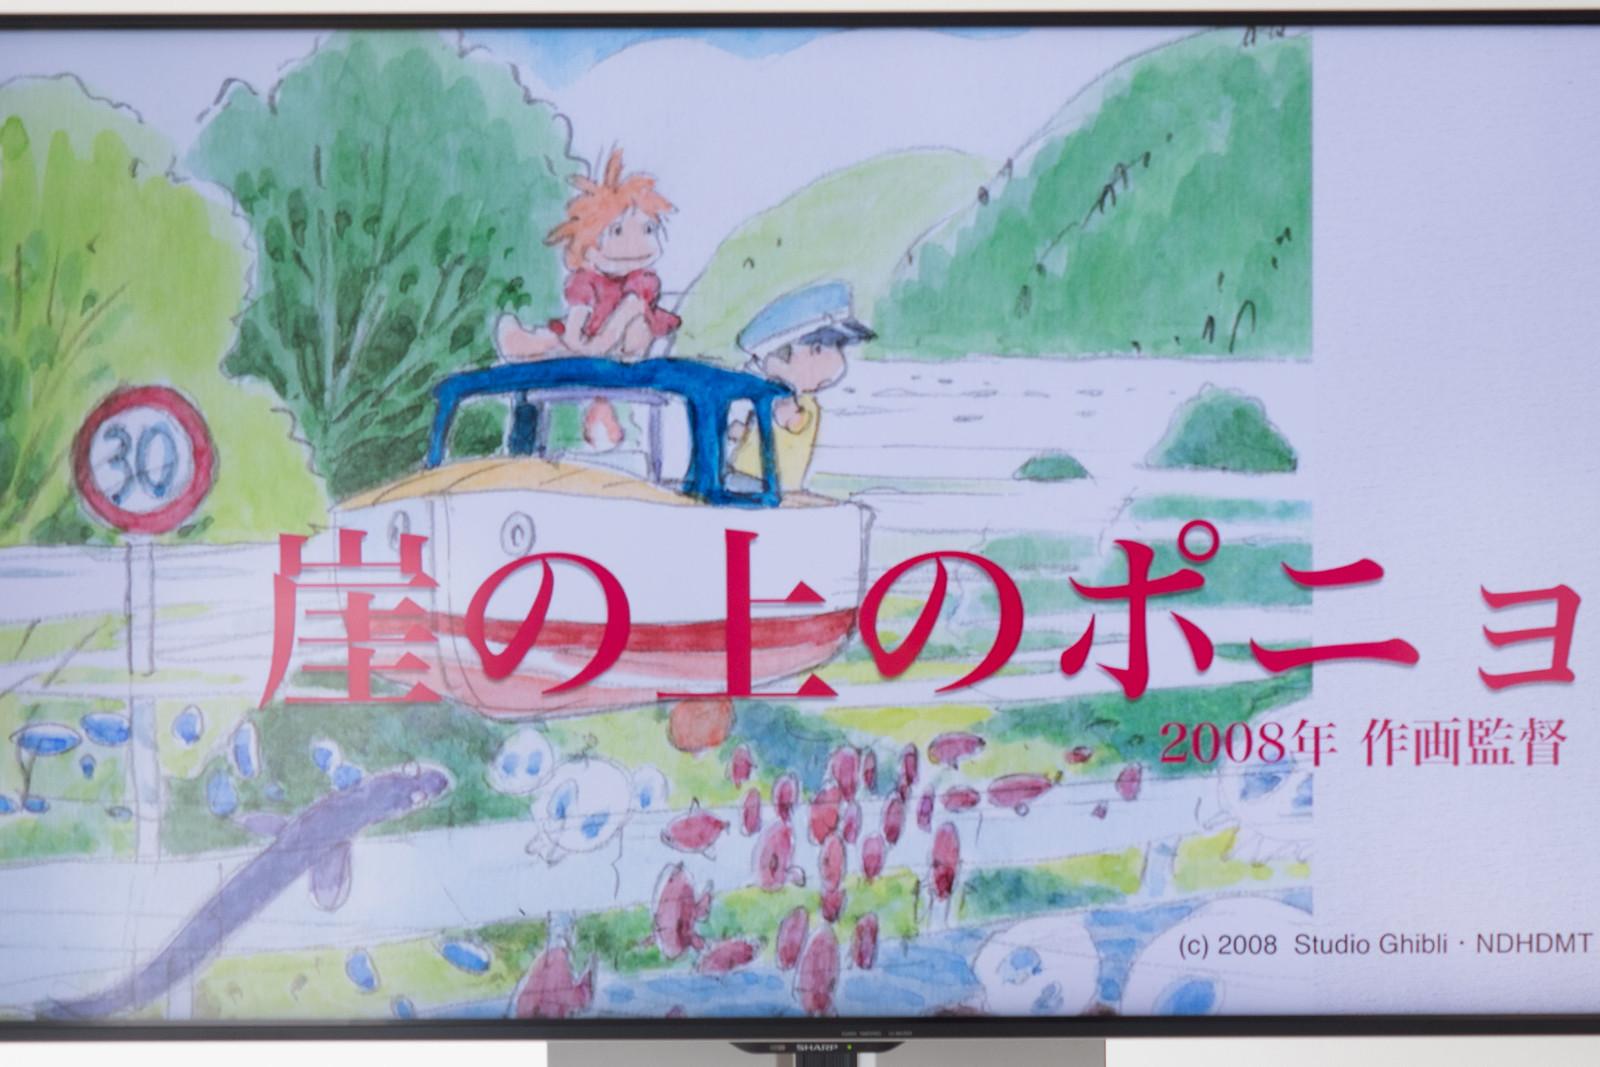 Ghibli_katsuyakondo-7